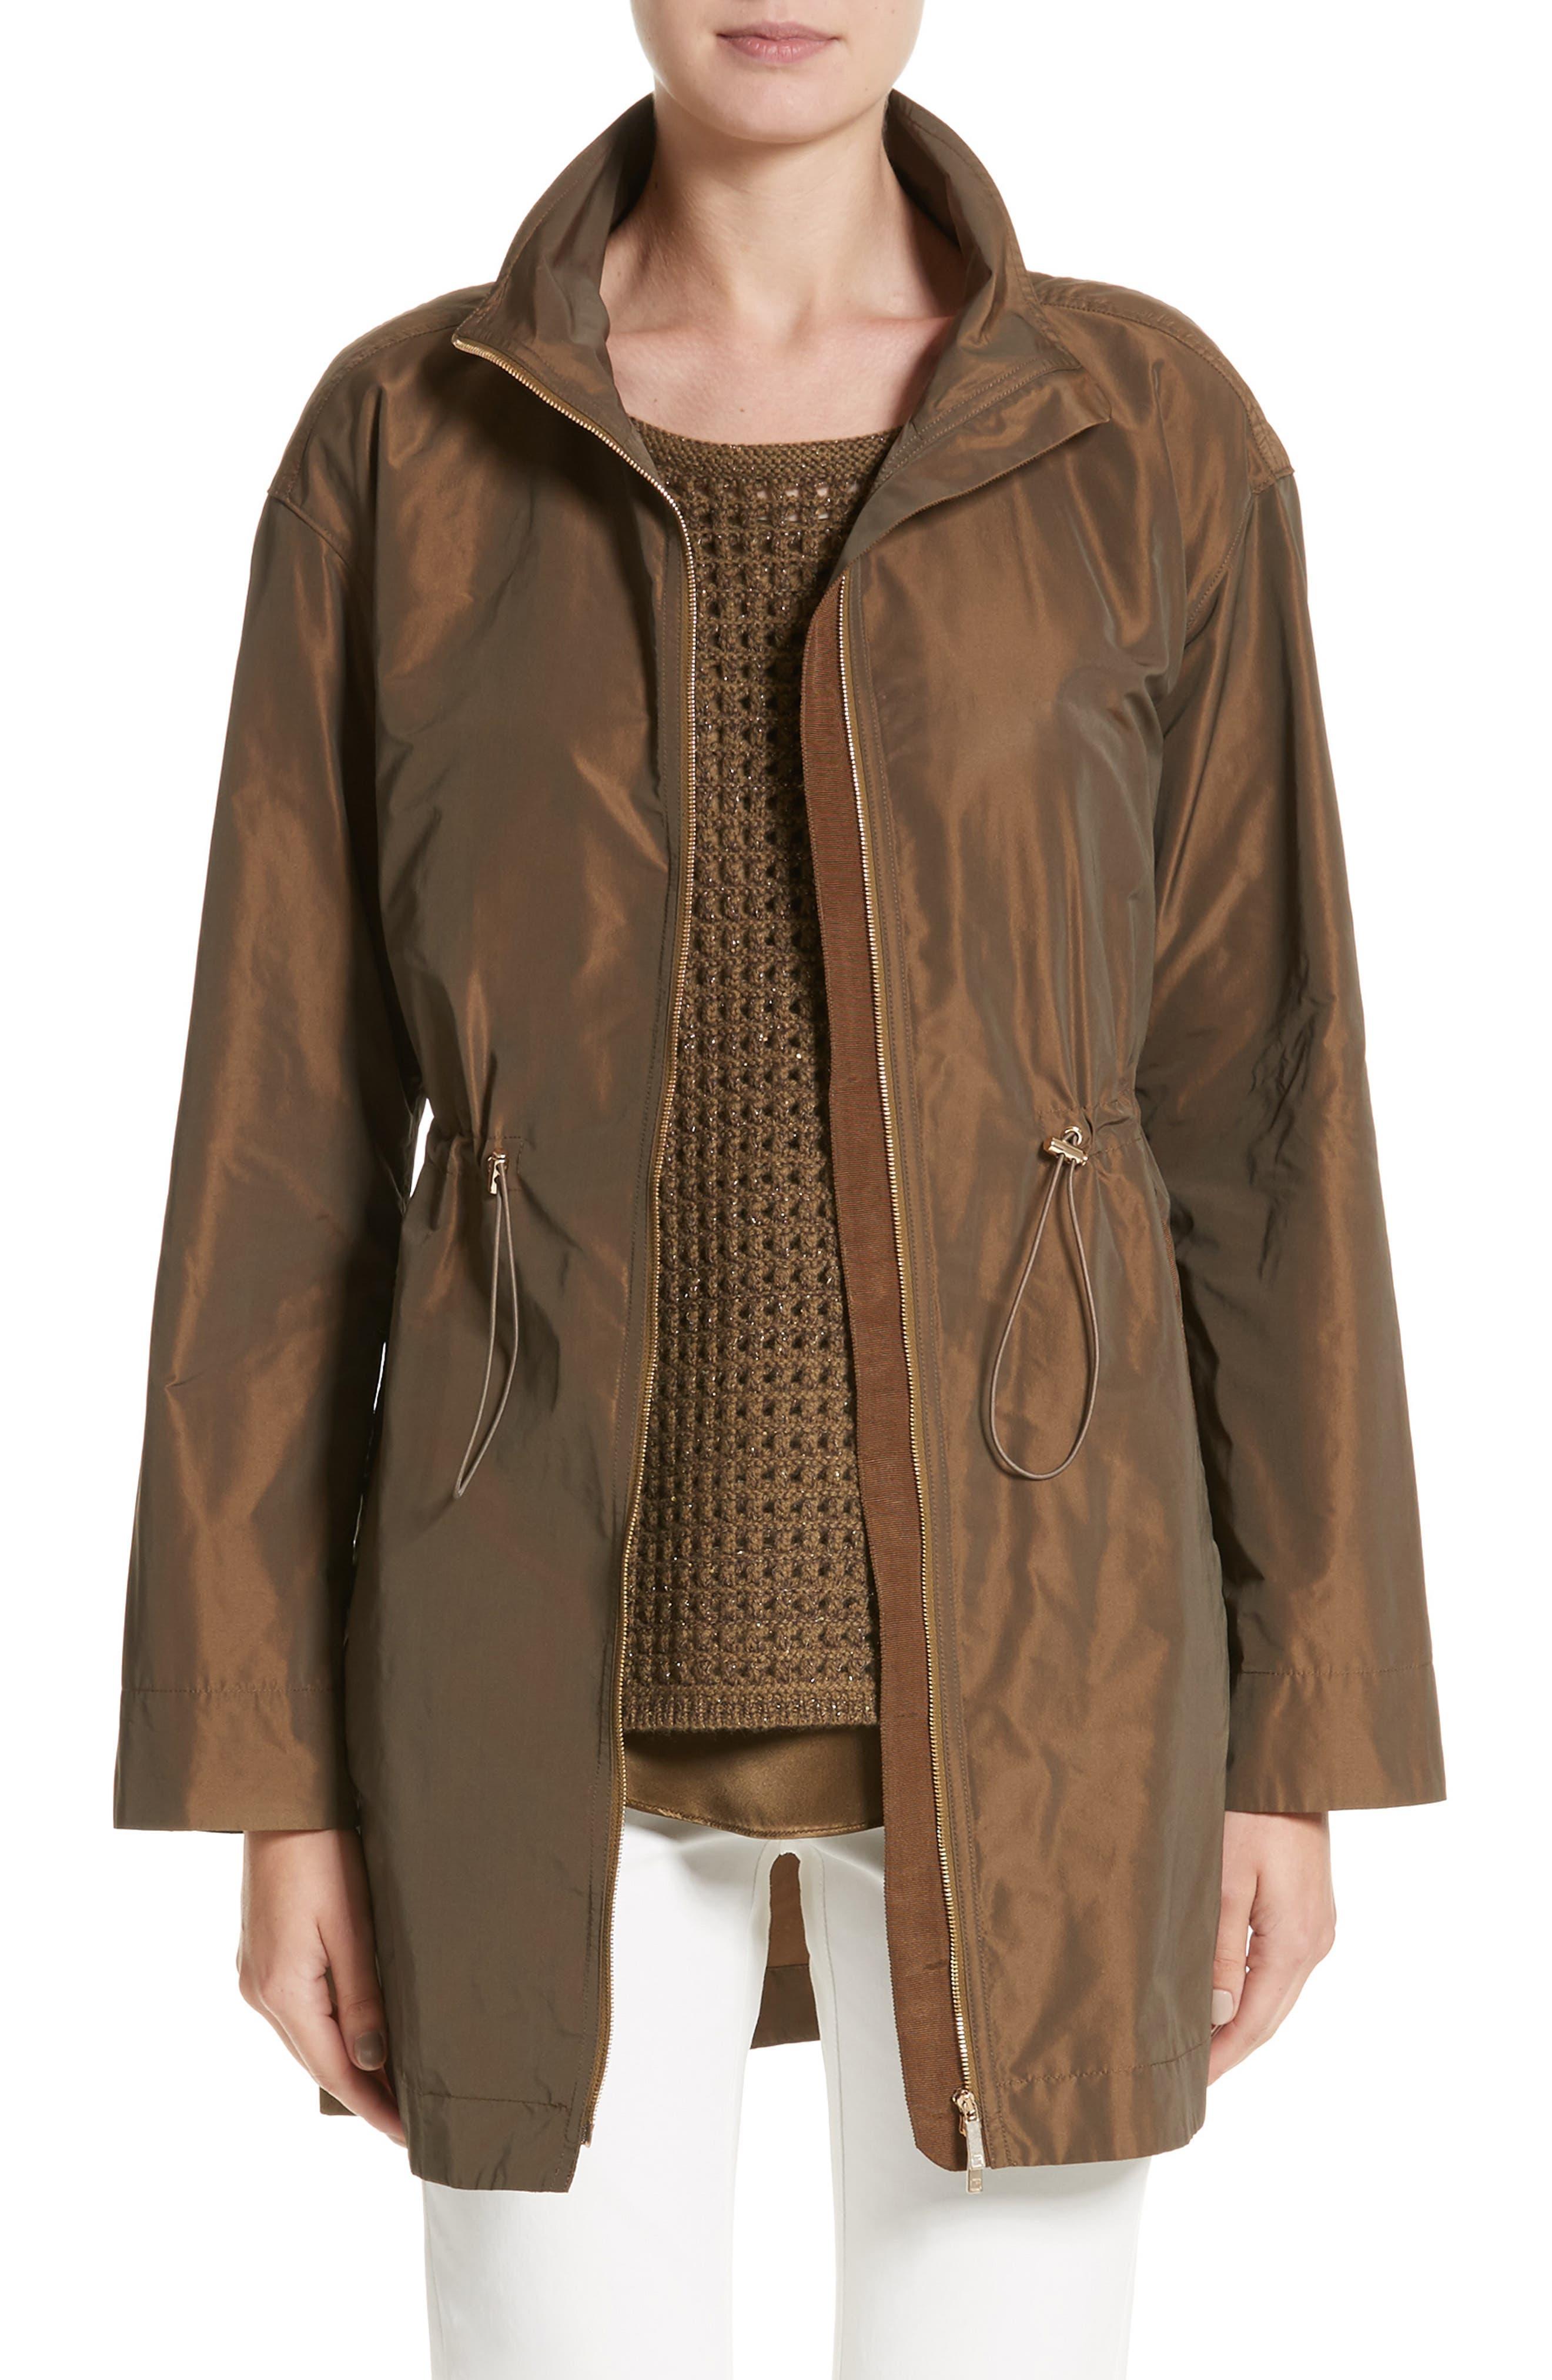 Lafayette 148 New York Nikolina Packable Jacket